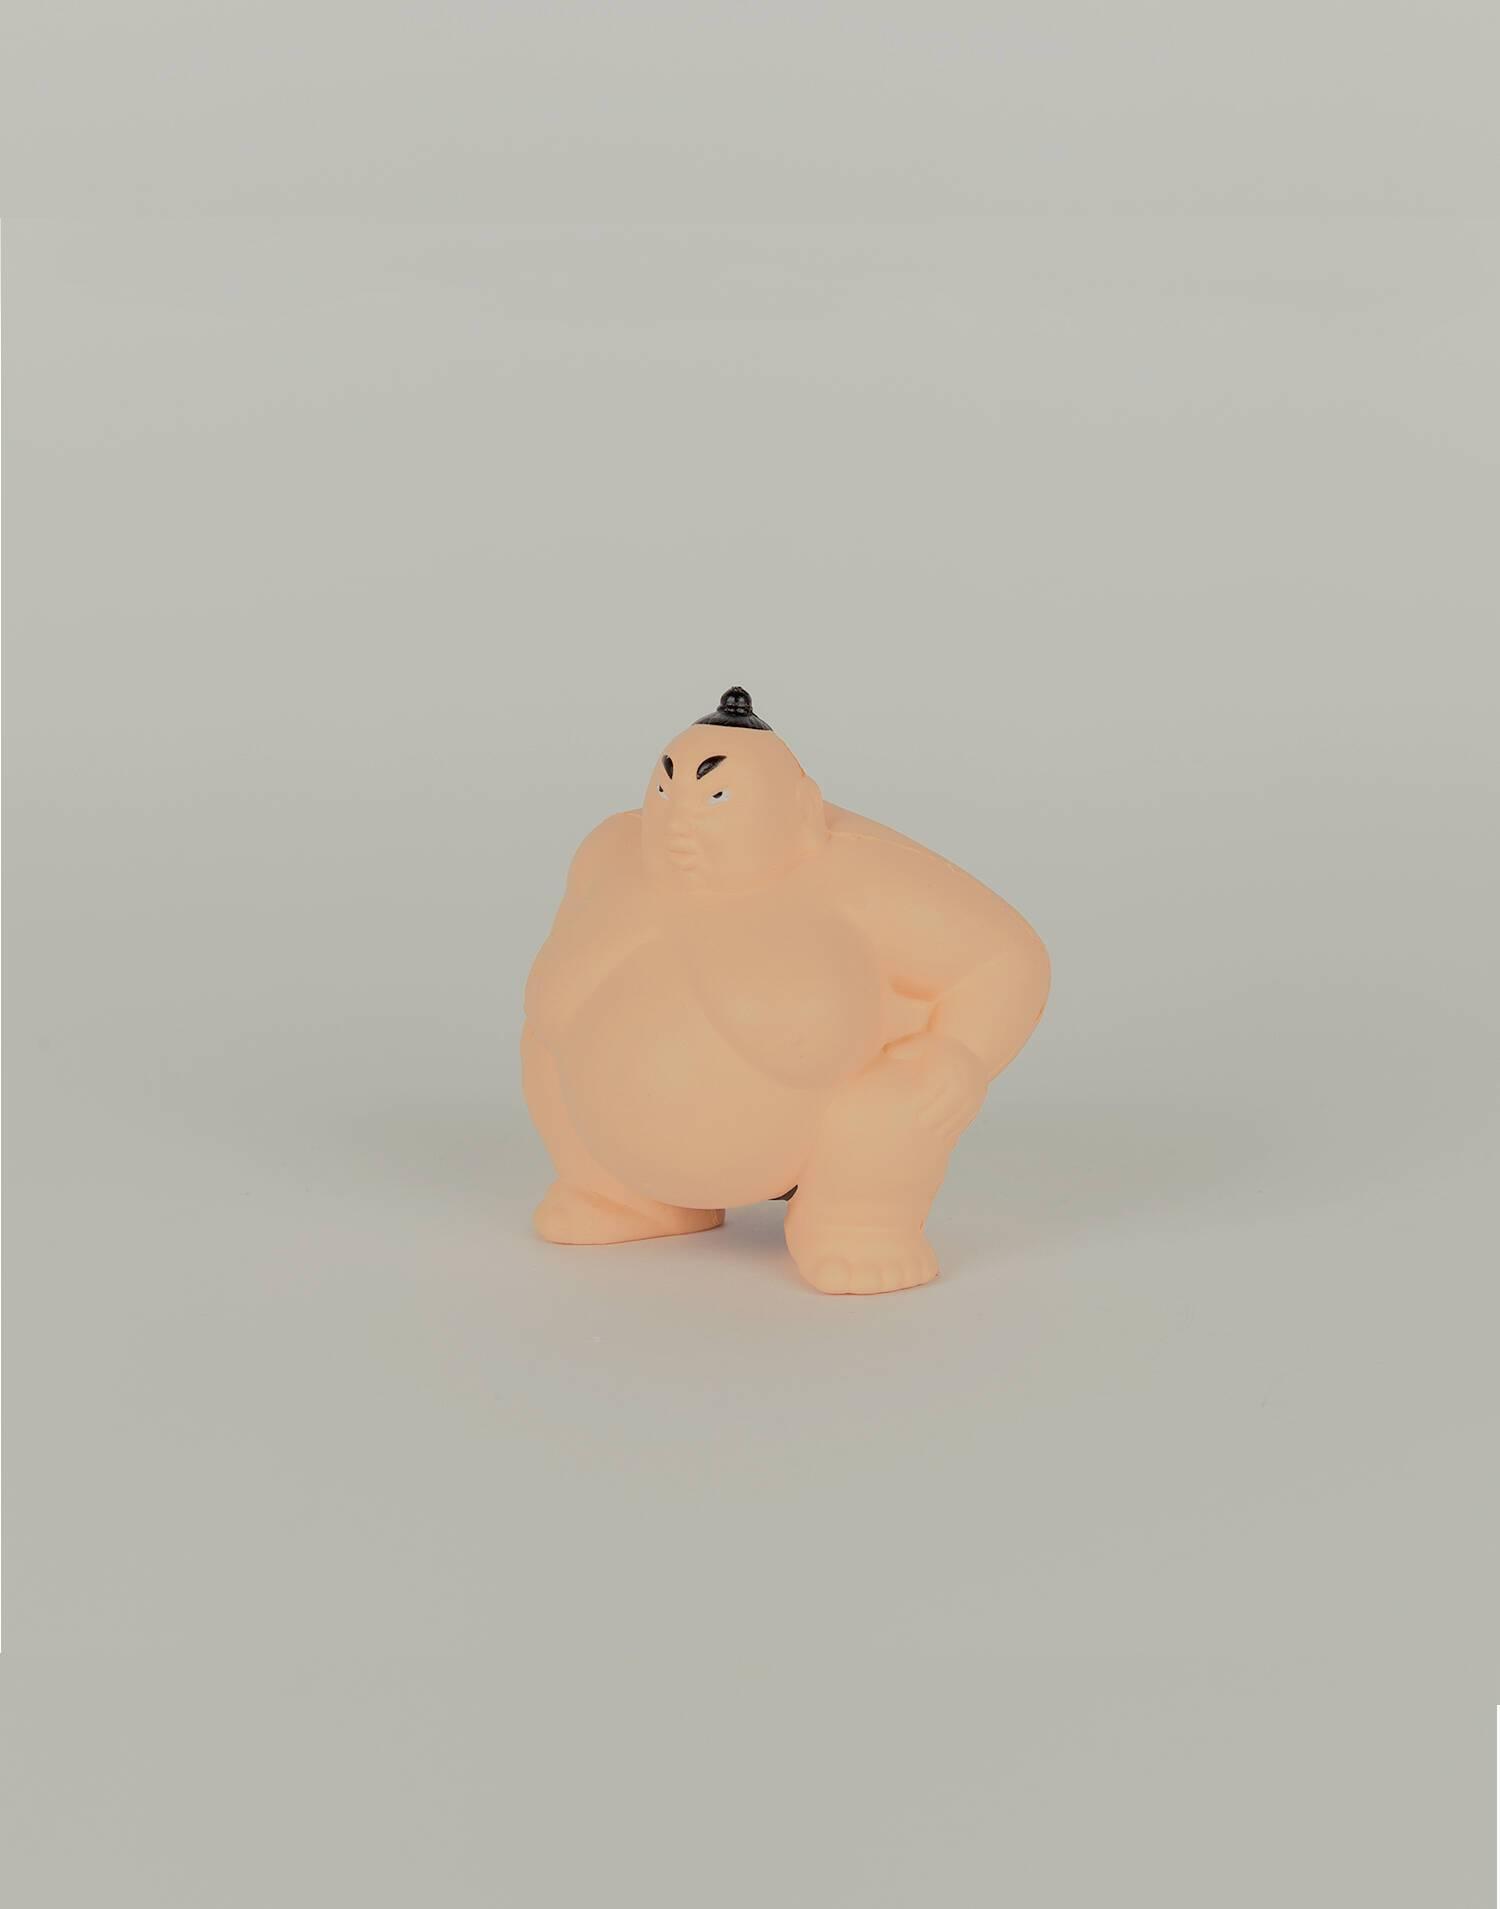 Sumo wrestler stress doll